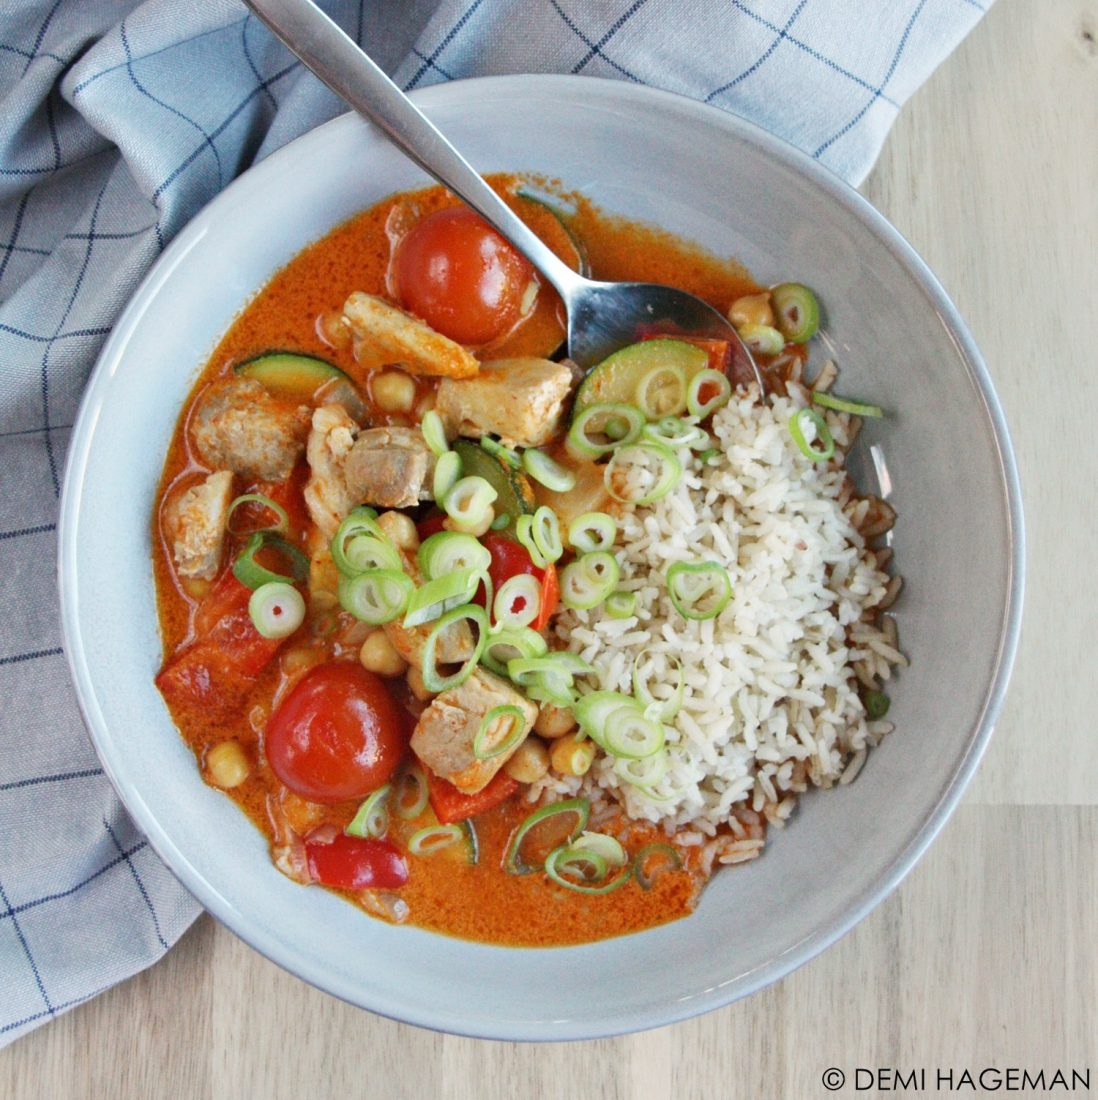 groentecurry met kip